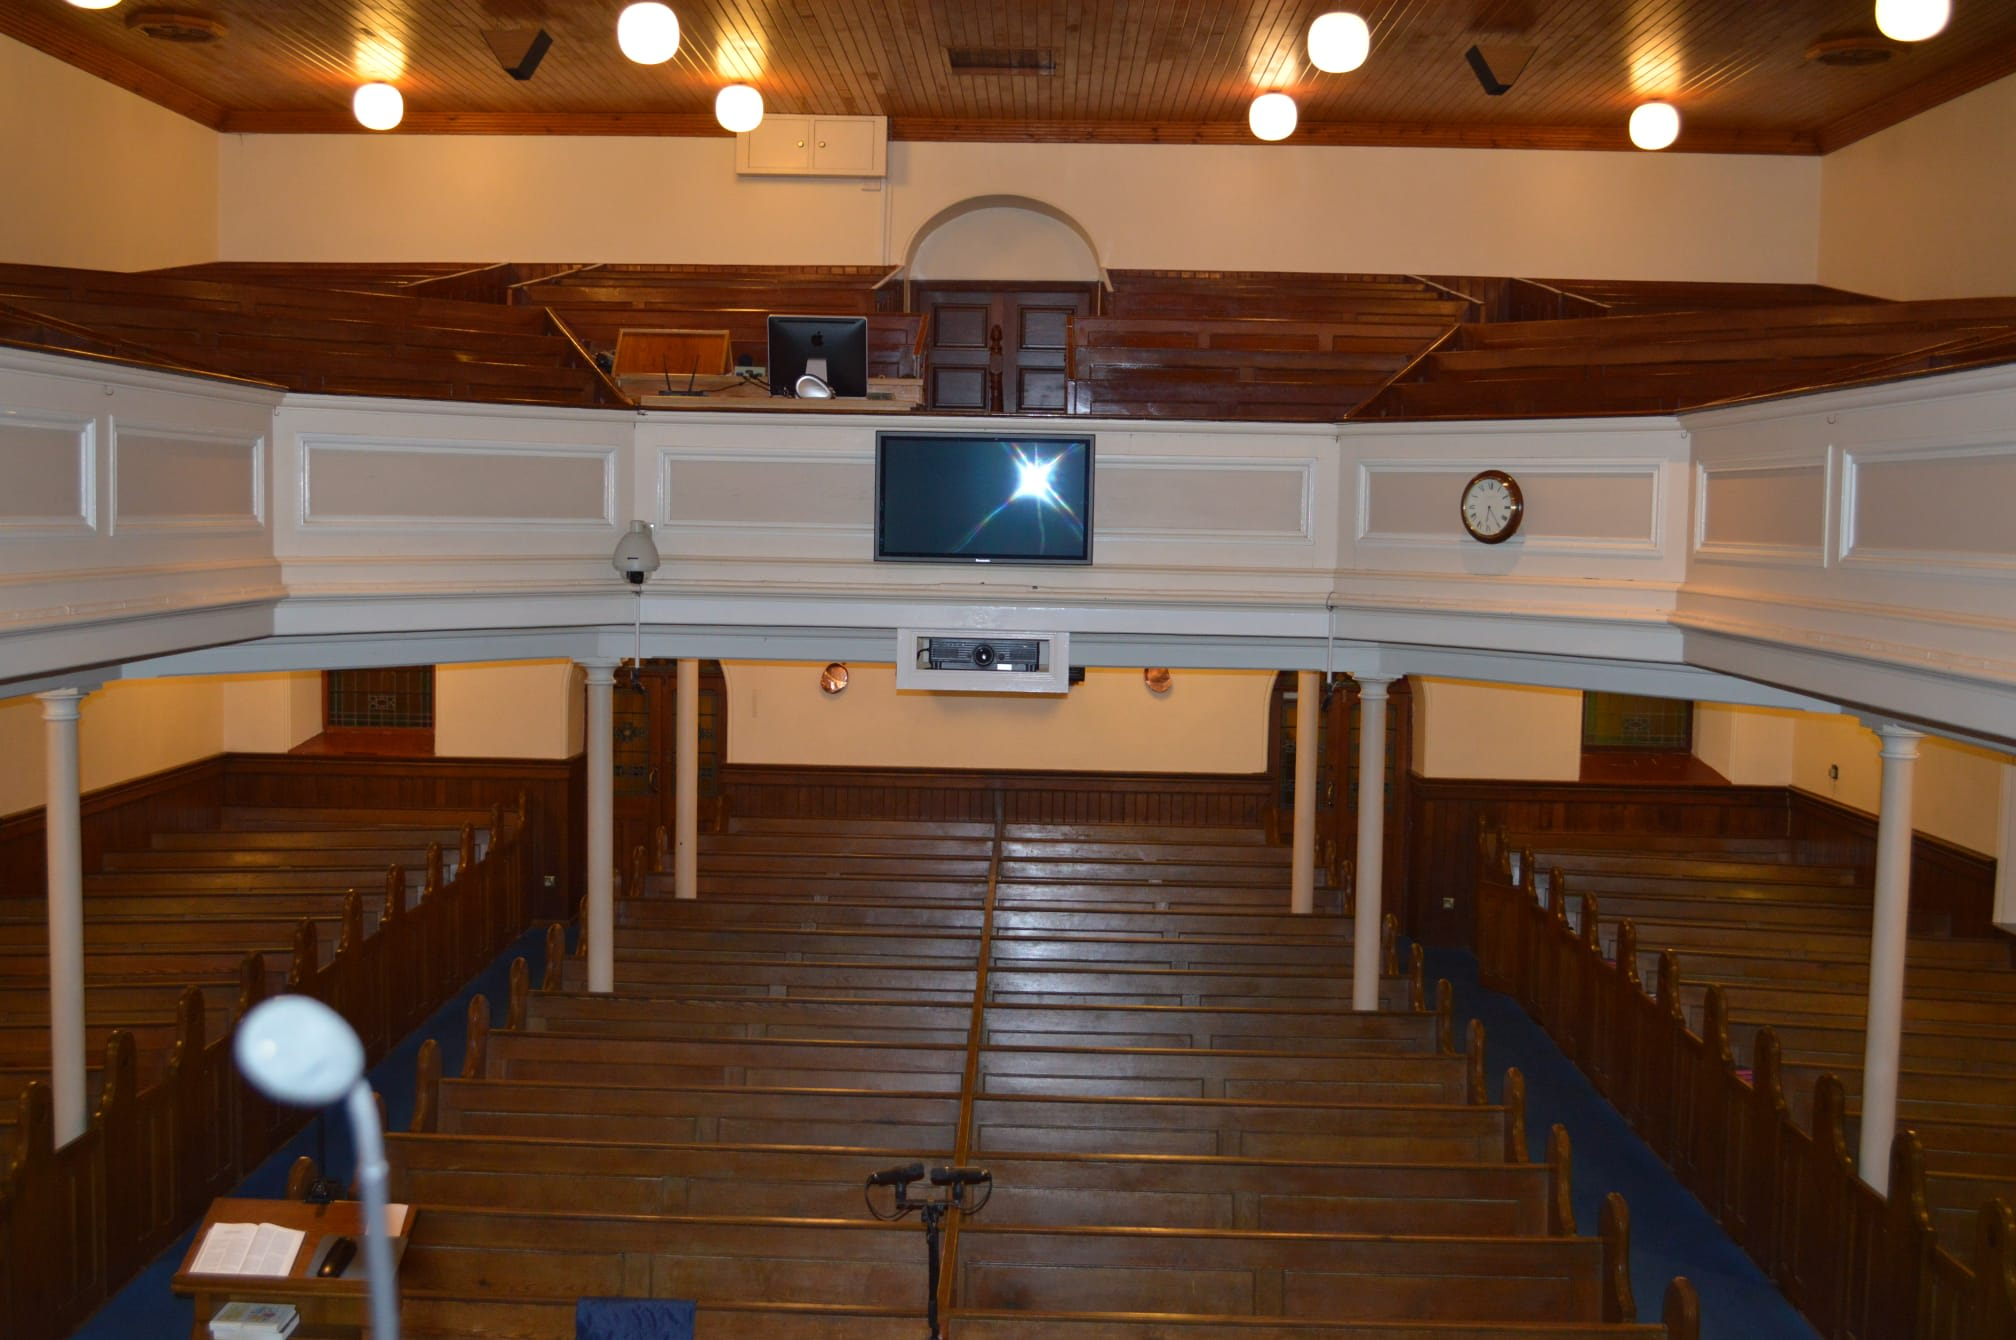 First Rathfriland Presbyterian Church | 39 Newry St, Newry BT34 5PY | +44 28 4063 0272